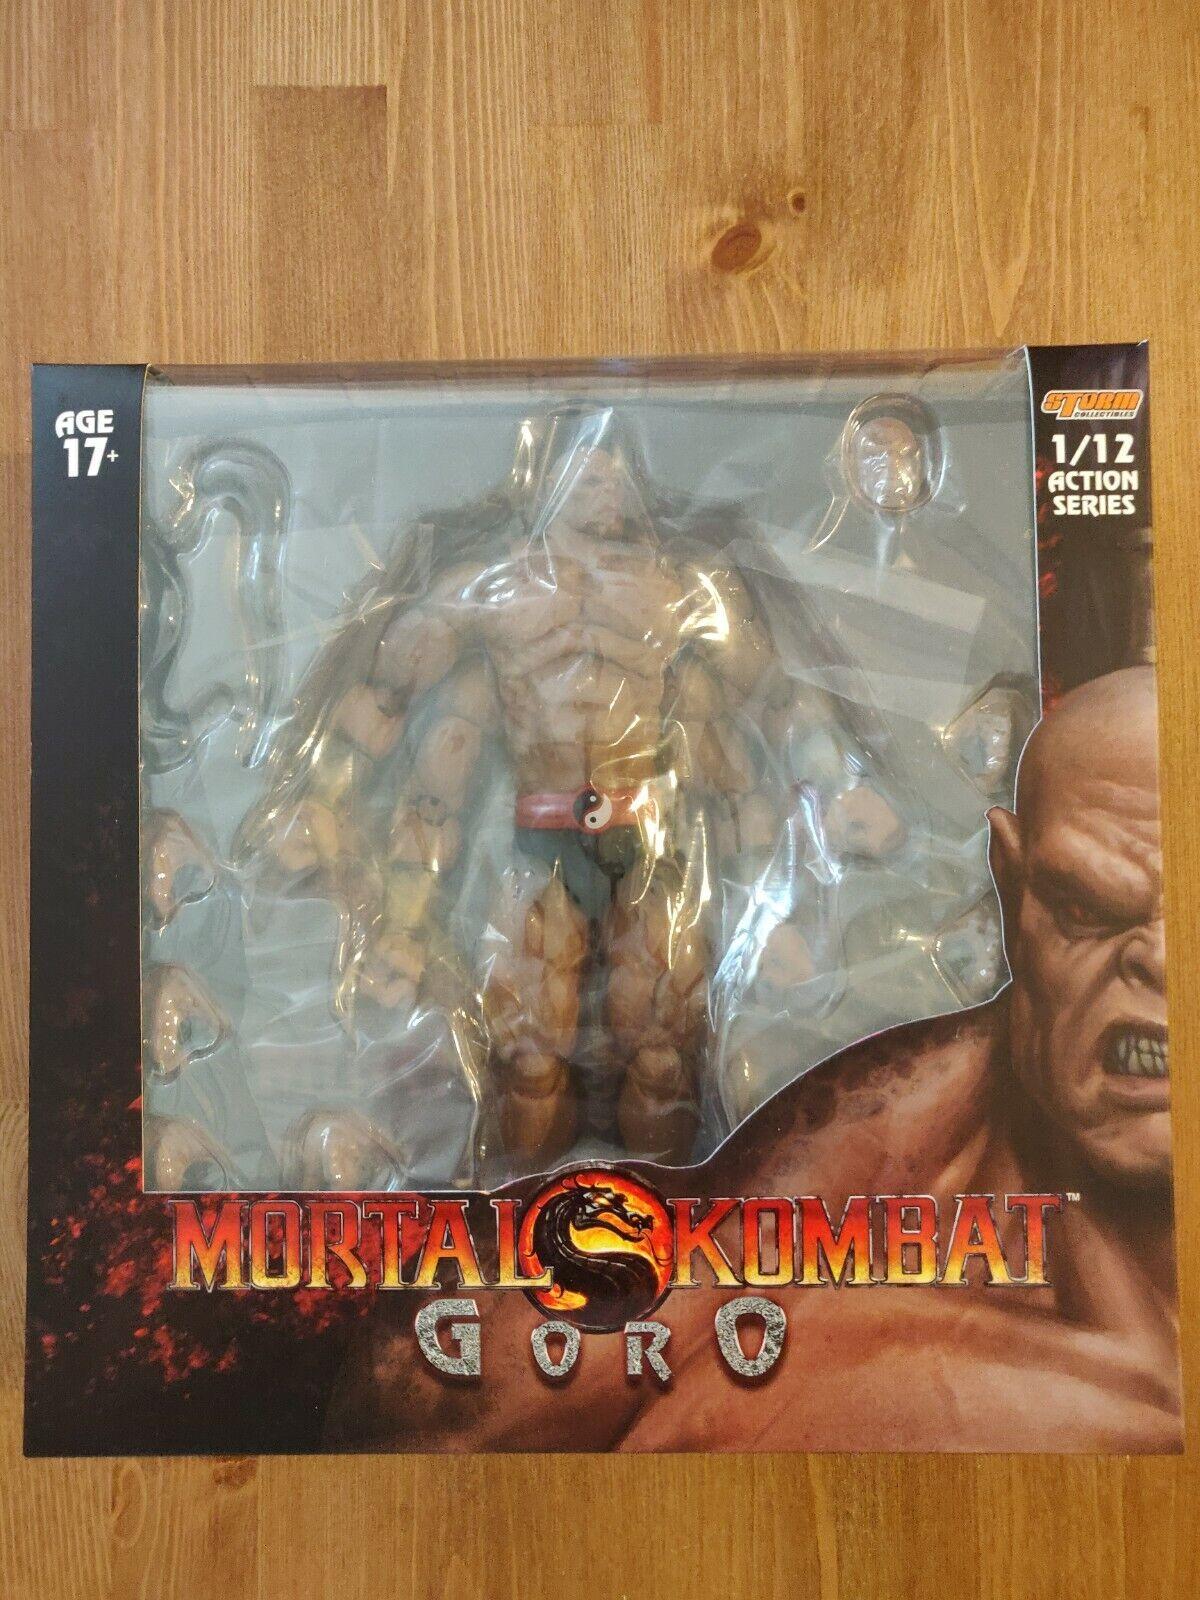 Mortal Kombat  Gor 1 12 Scale Action Figure  Storm Collectibles